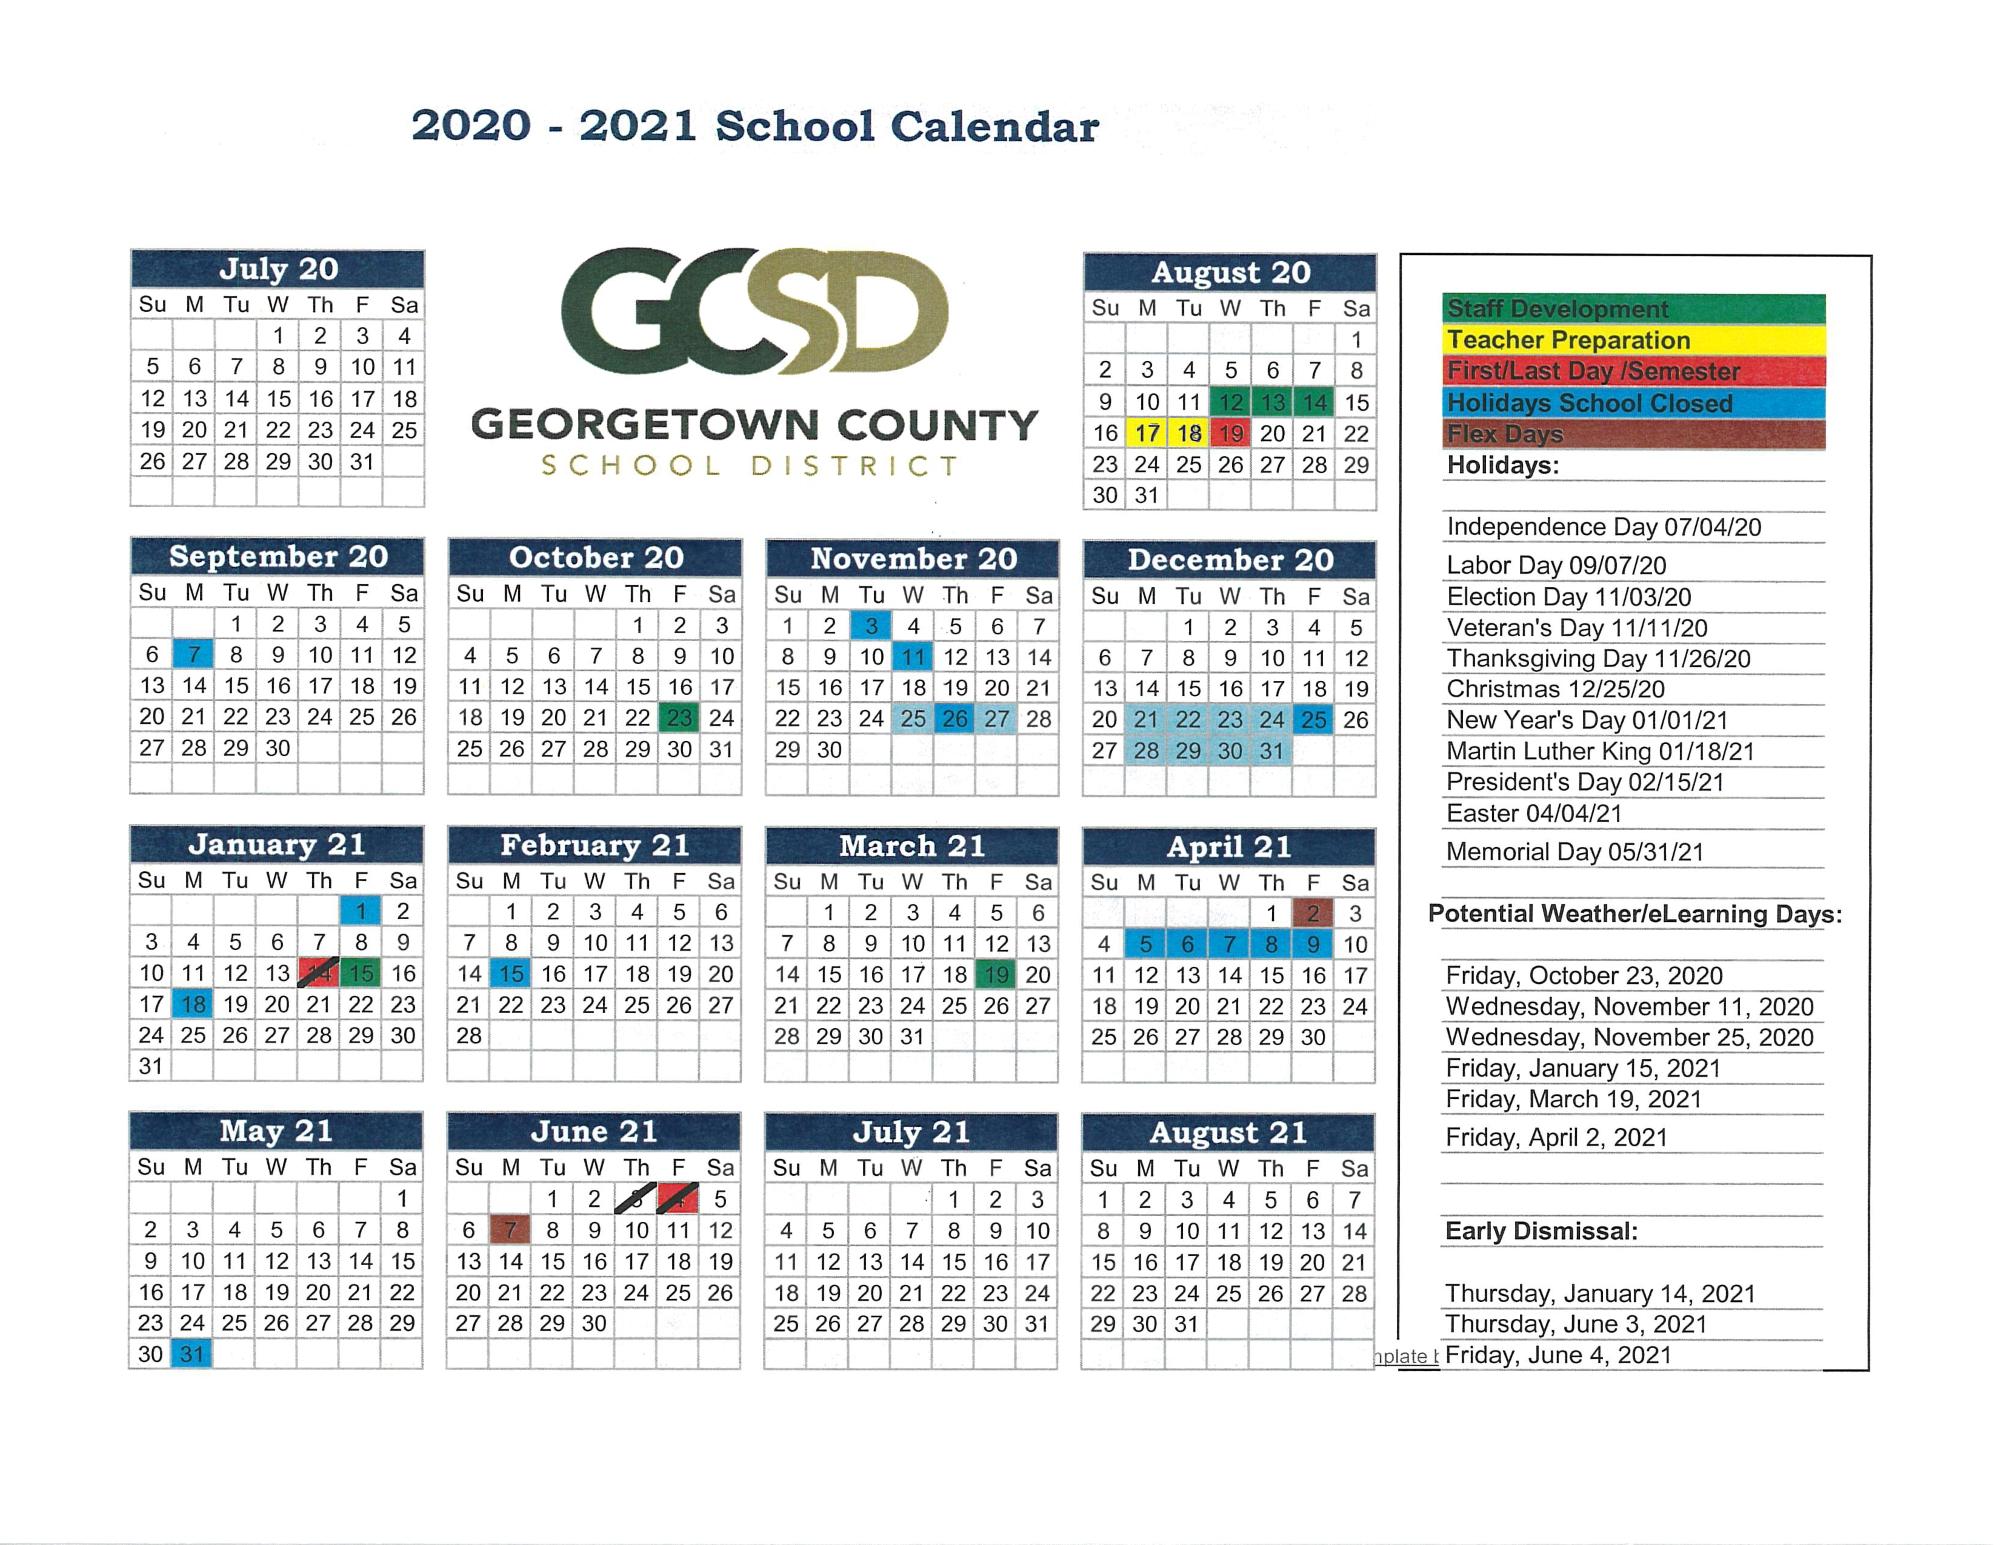 East Windsor Regional School Calendar | Printable Calendar Throughout College Of Staten Island Calendar 2021